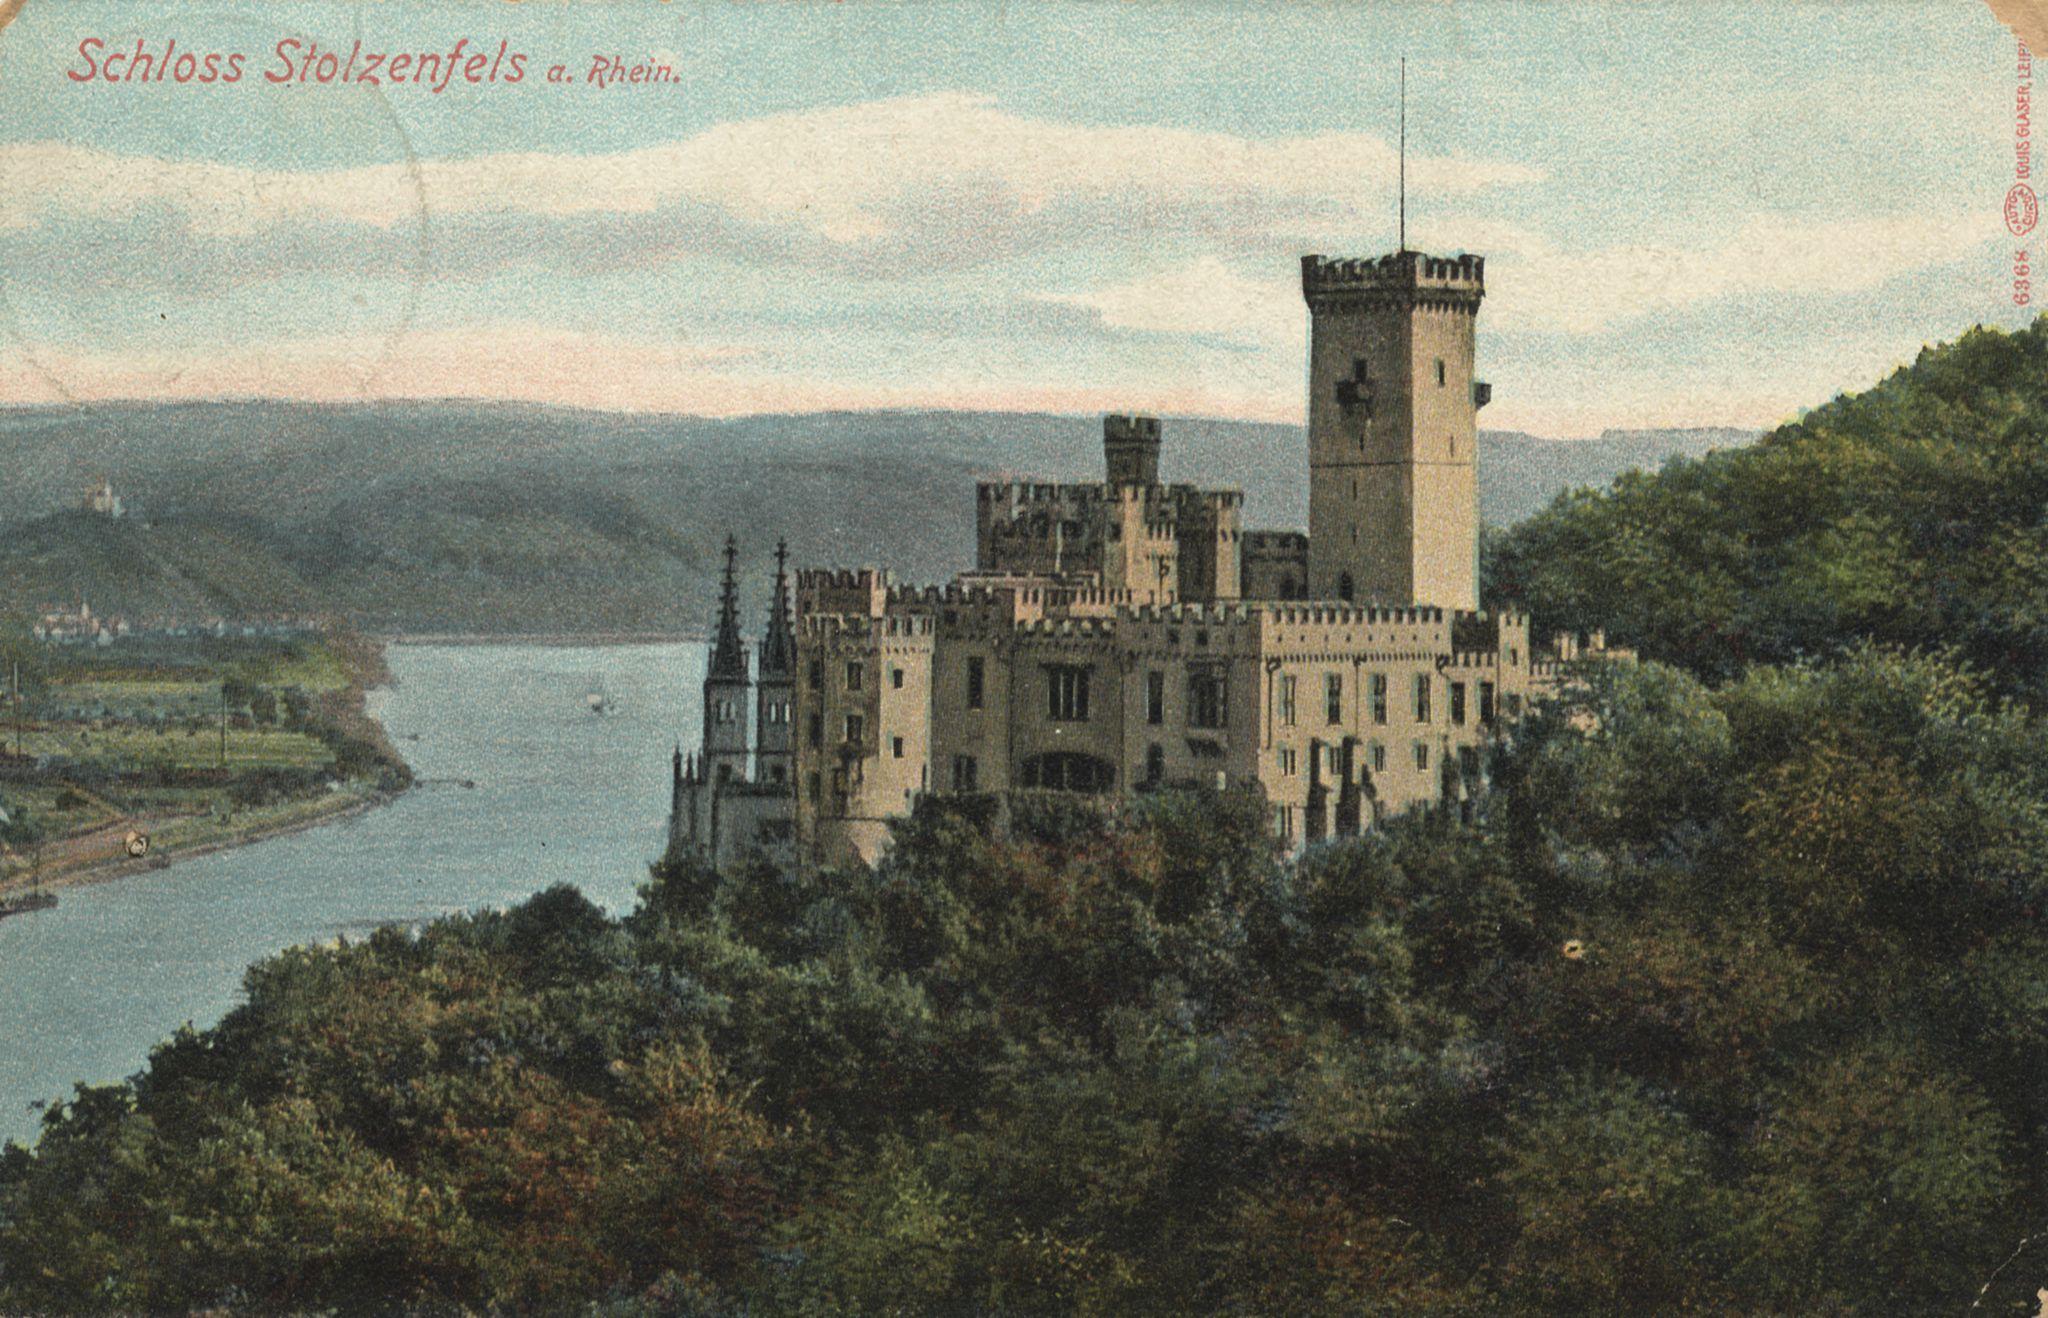 Besondere Ansichten, Schlösser und Burgen, Schloss Stolzenfels am Rhein www.zeno.org Schloss Stolzenfels am Rhein